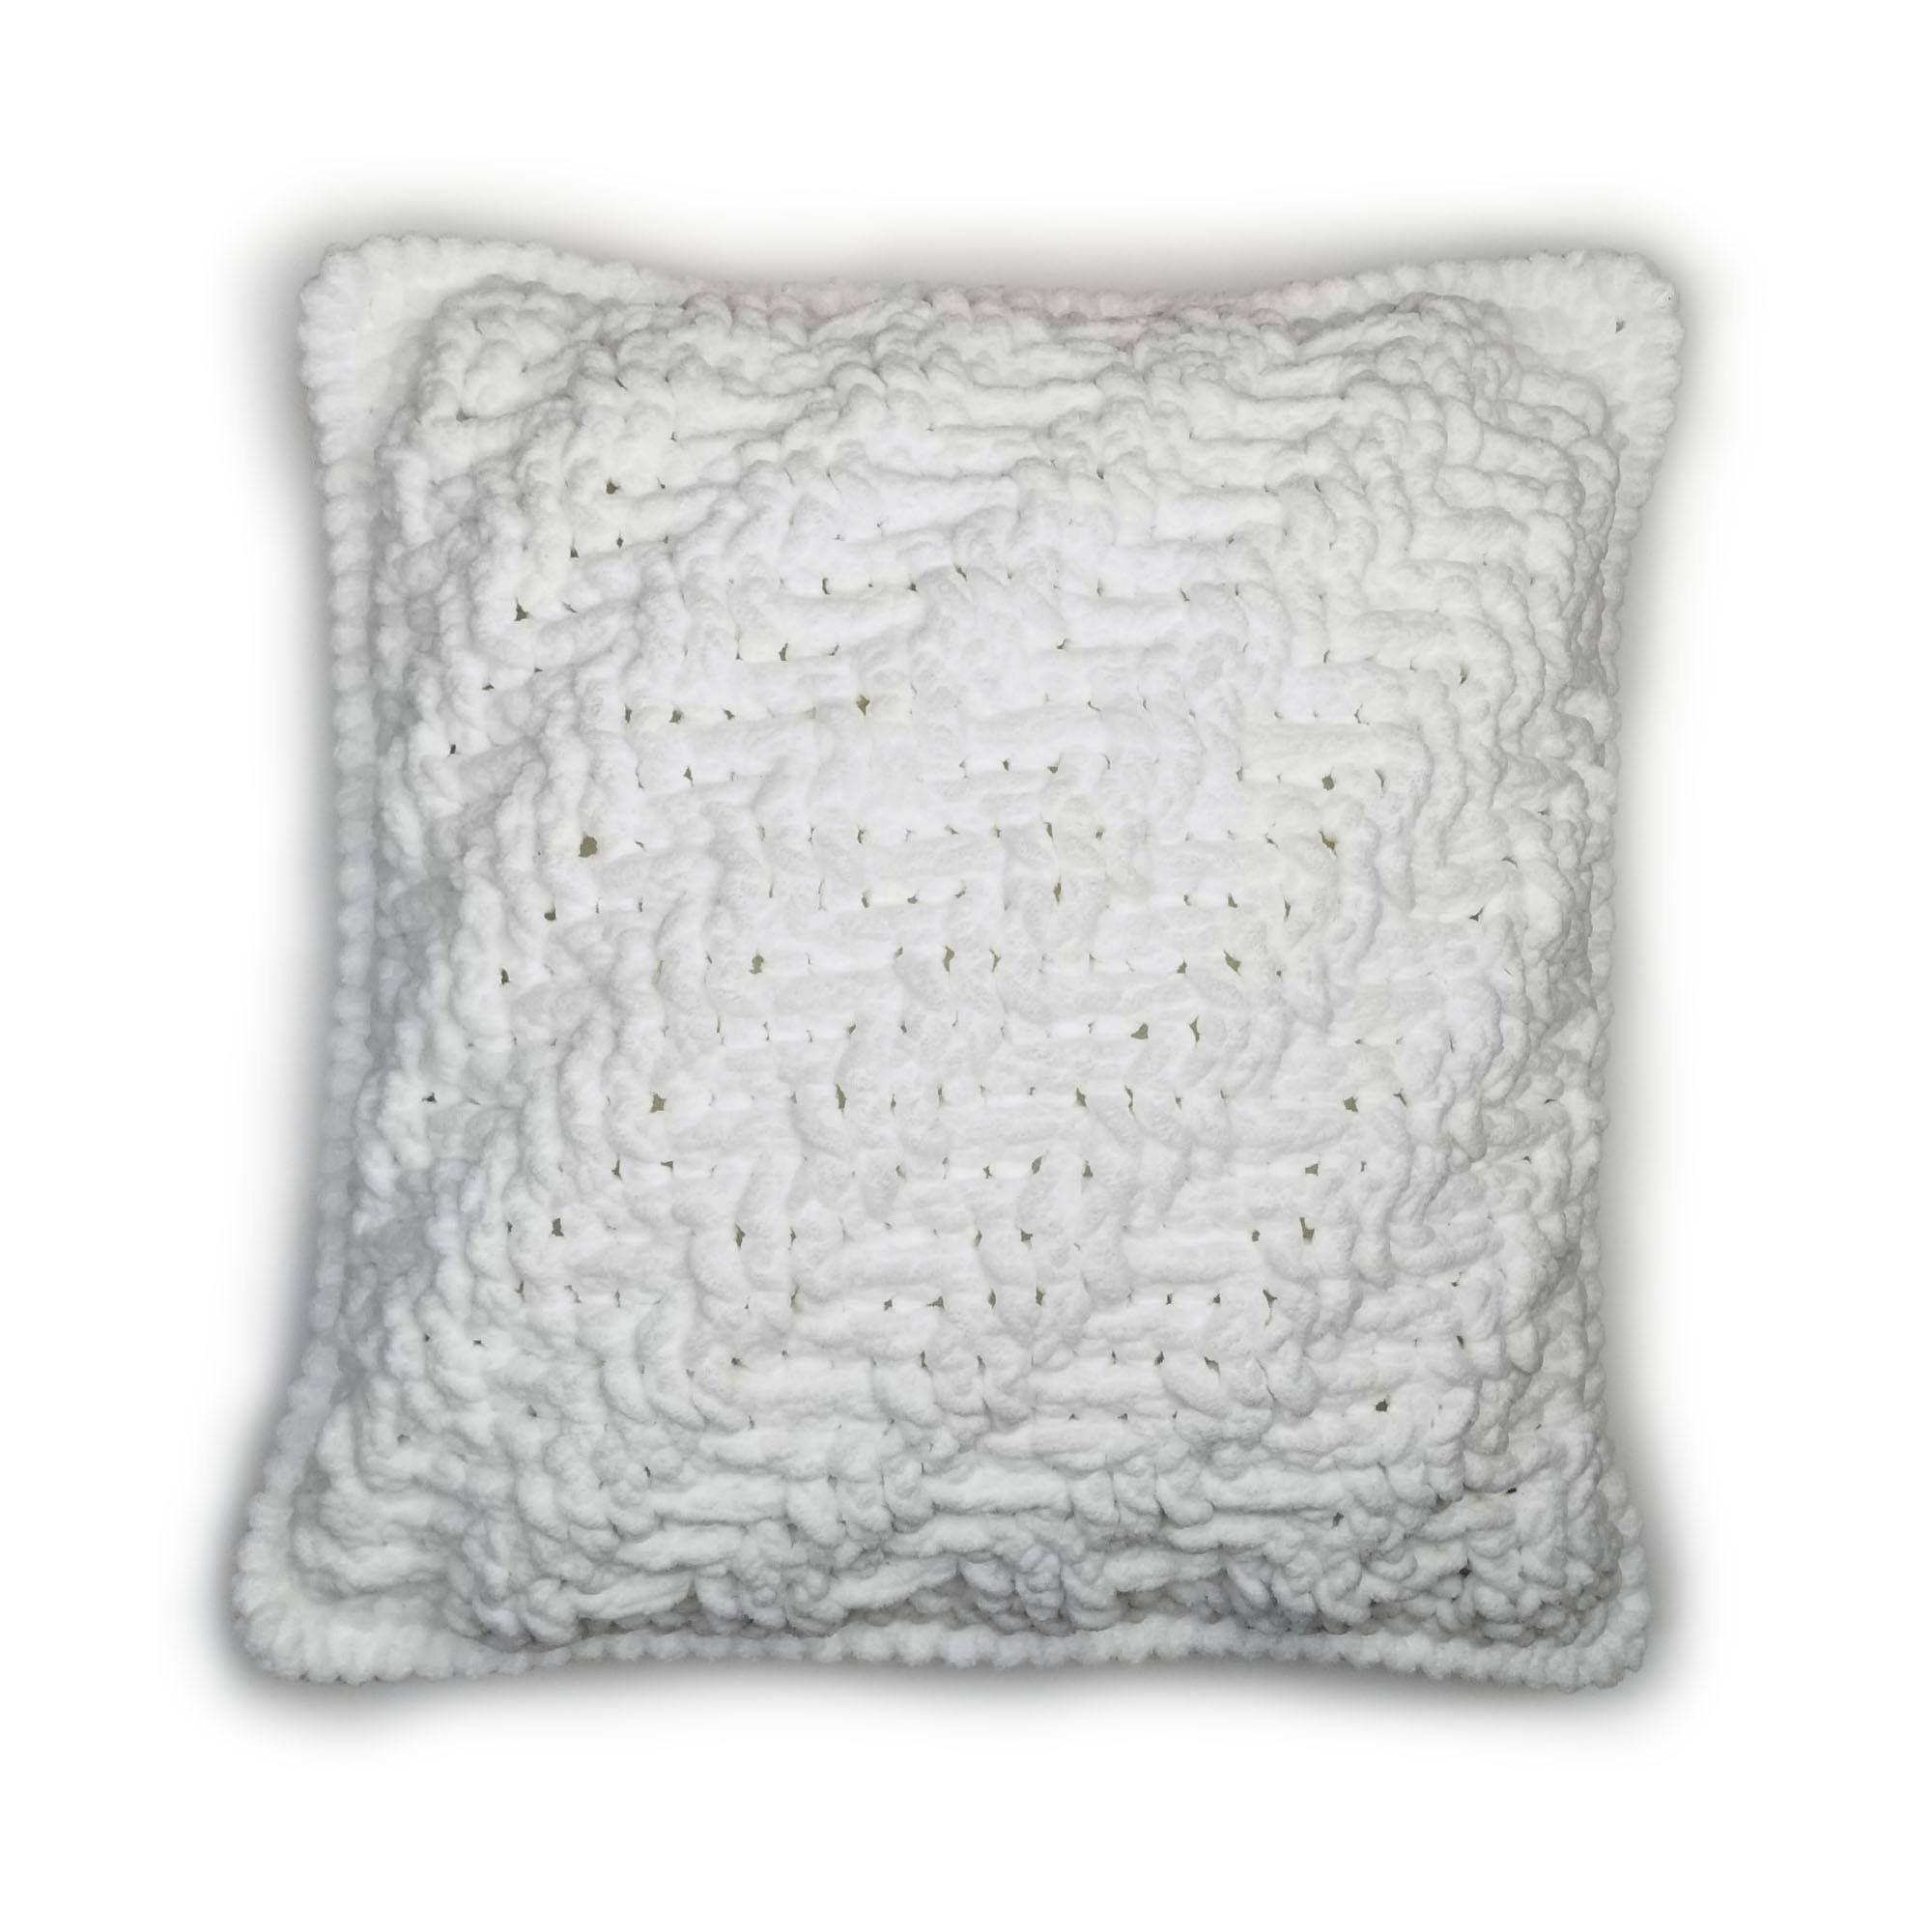 Diagonal Stripes And Texture Crochet Pillow Moogly